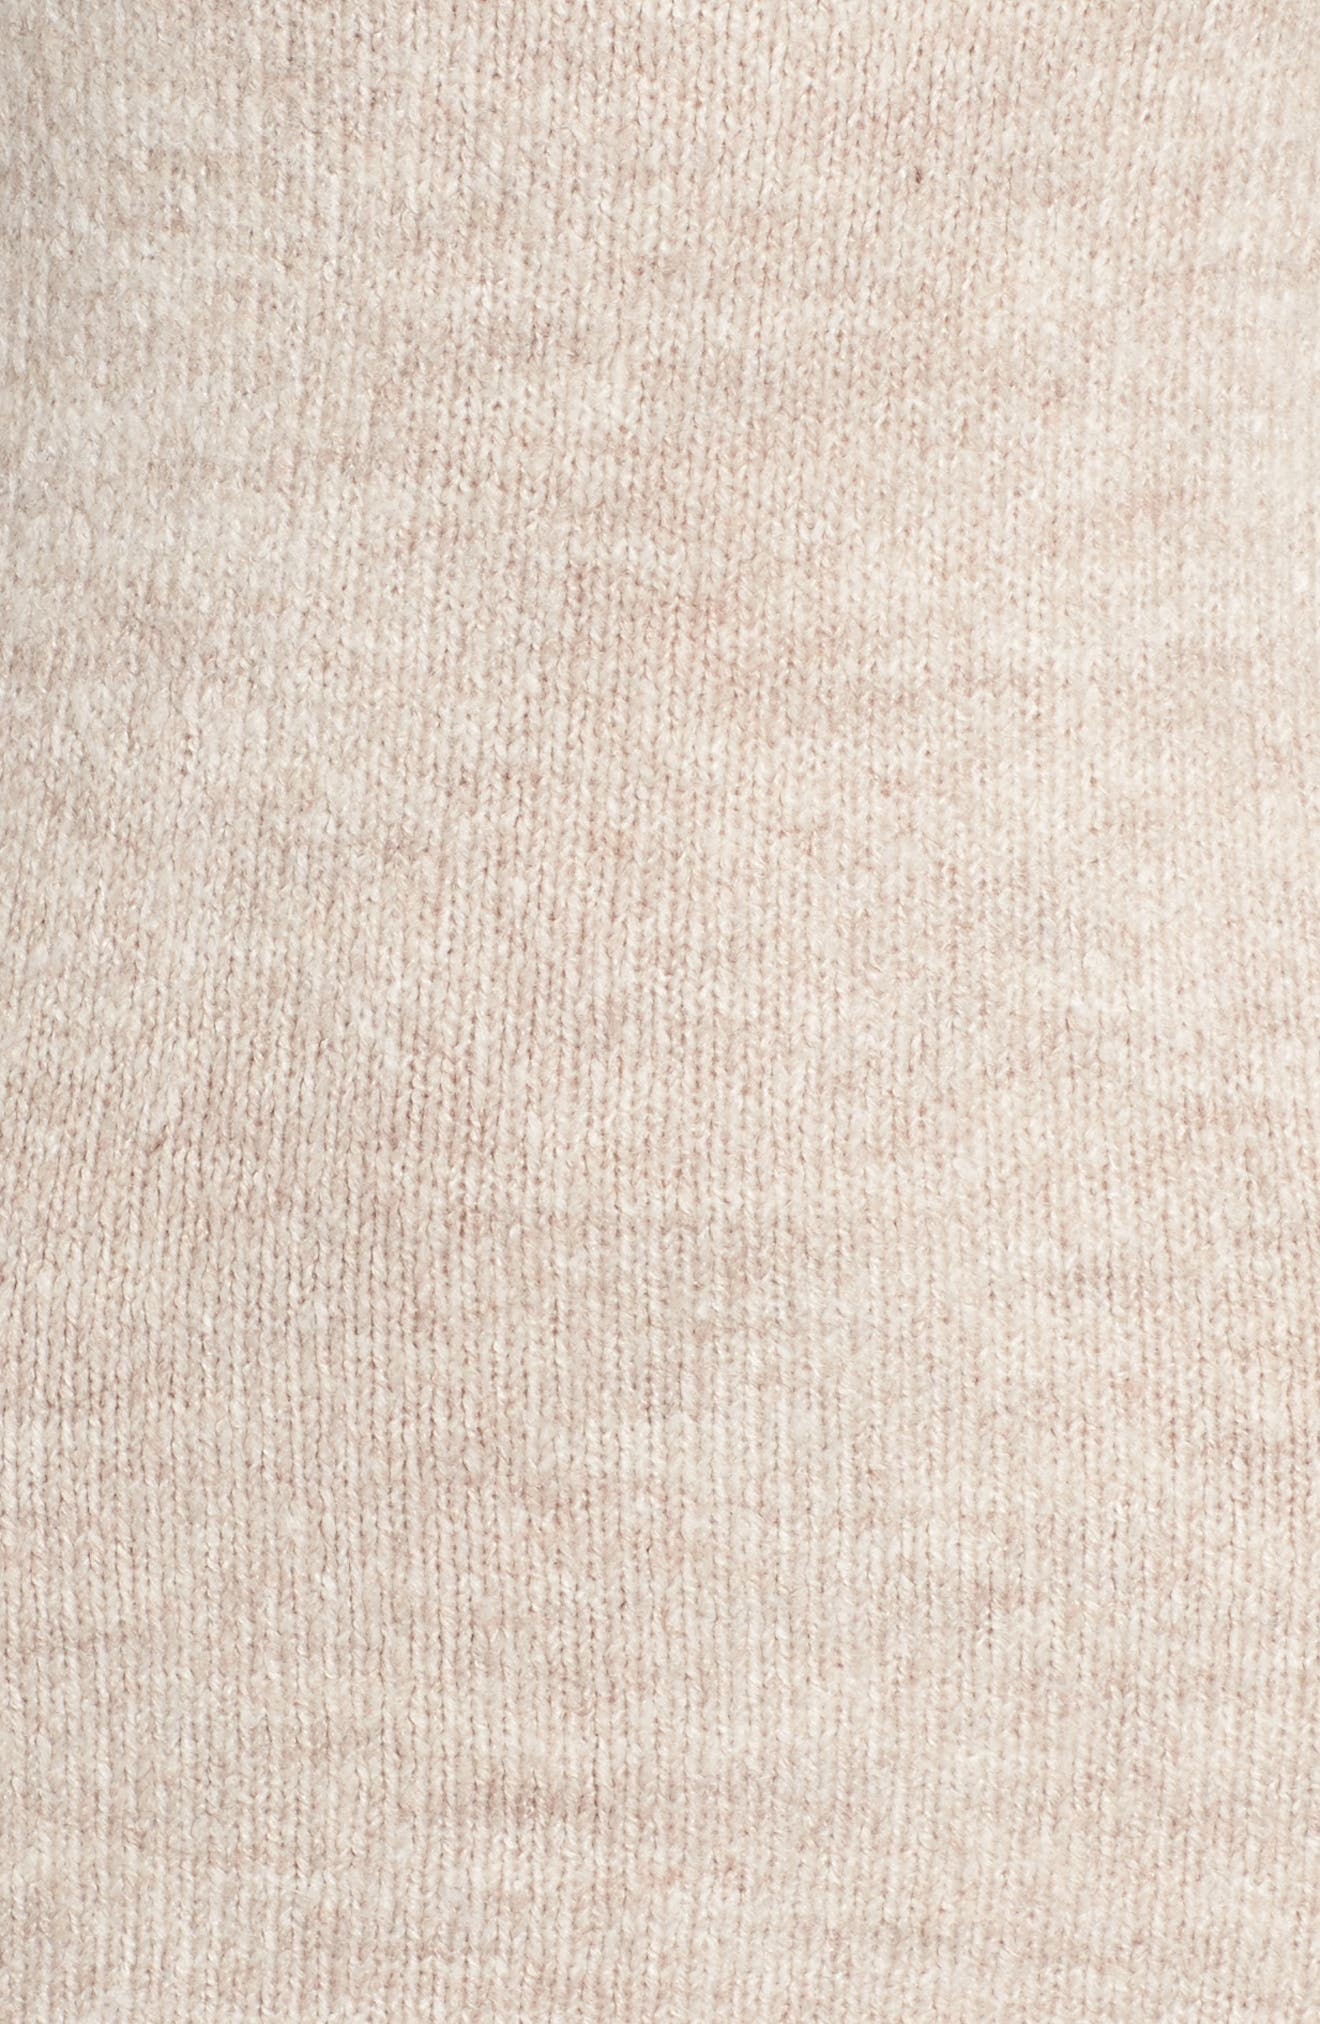 Bell Sleeve Knit Dress,                             Alternate thumbnail 10, color,